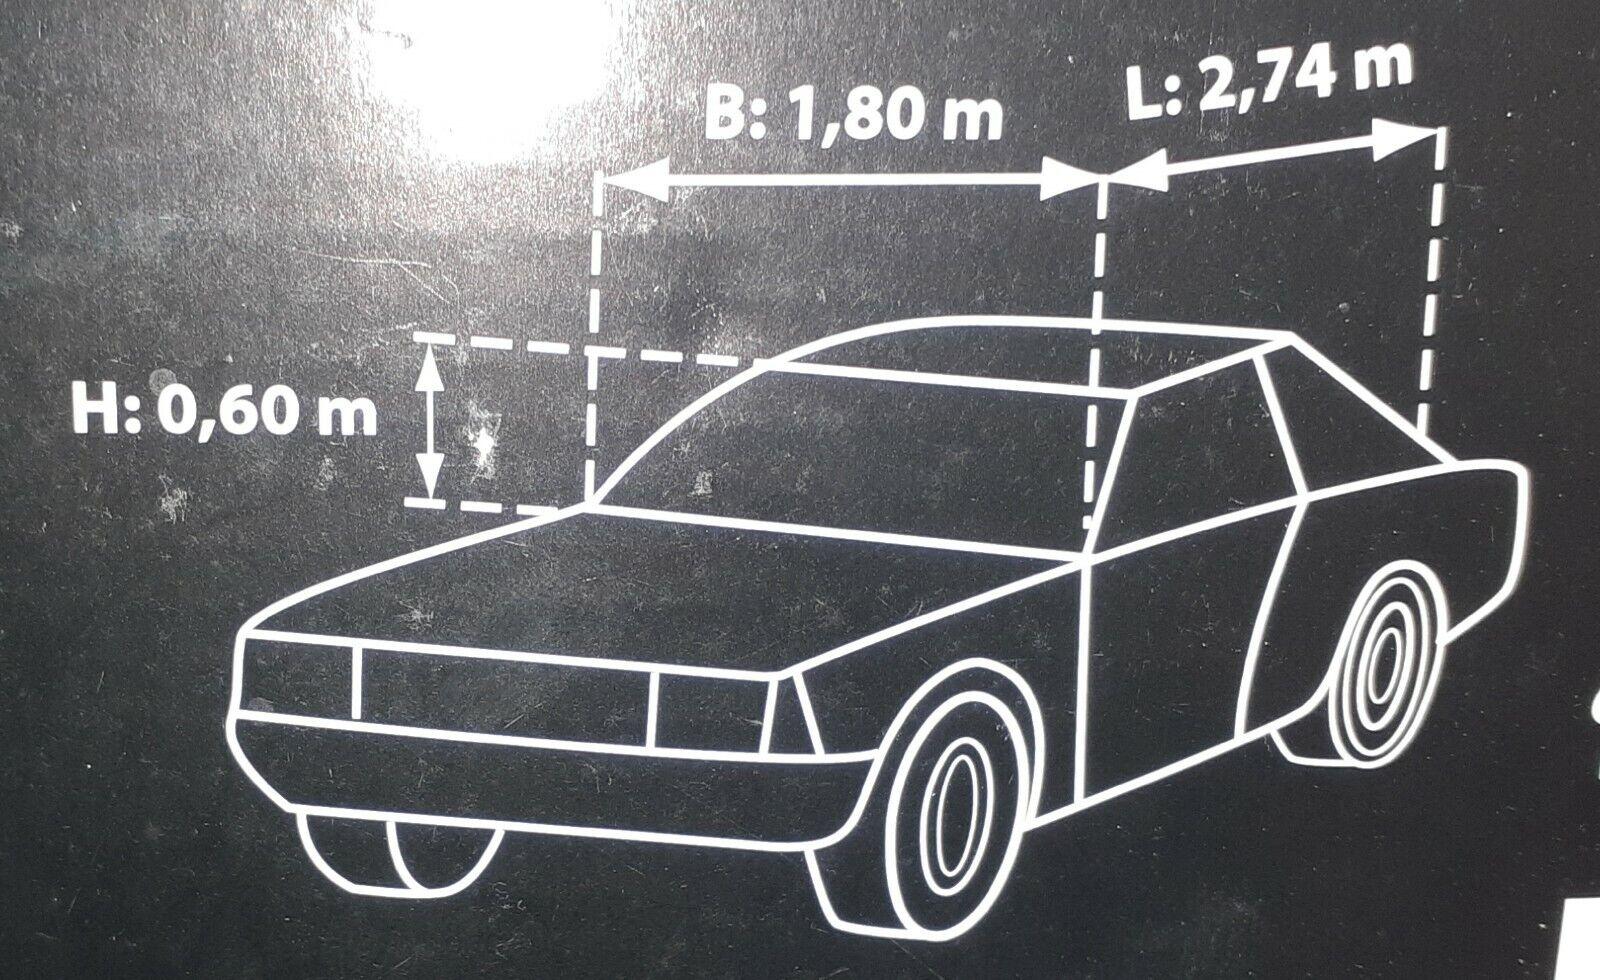 Halbgarage Auto KfZ LXL 100 wasserfest BMW,Mercedes, FORD,VW, Opel (Liste)NEU